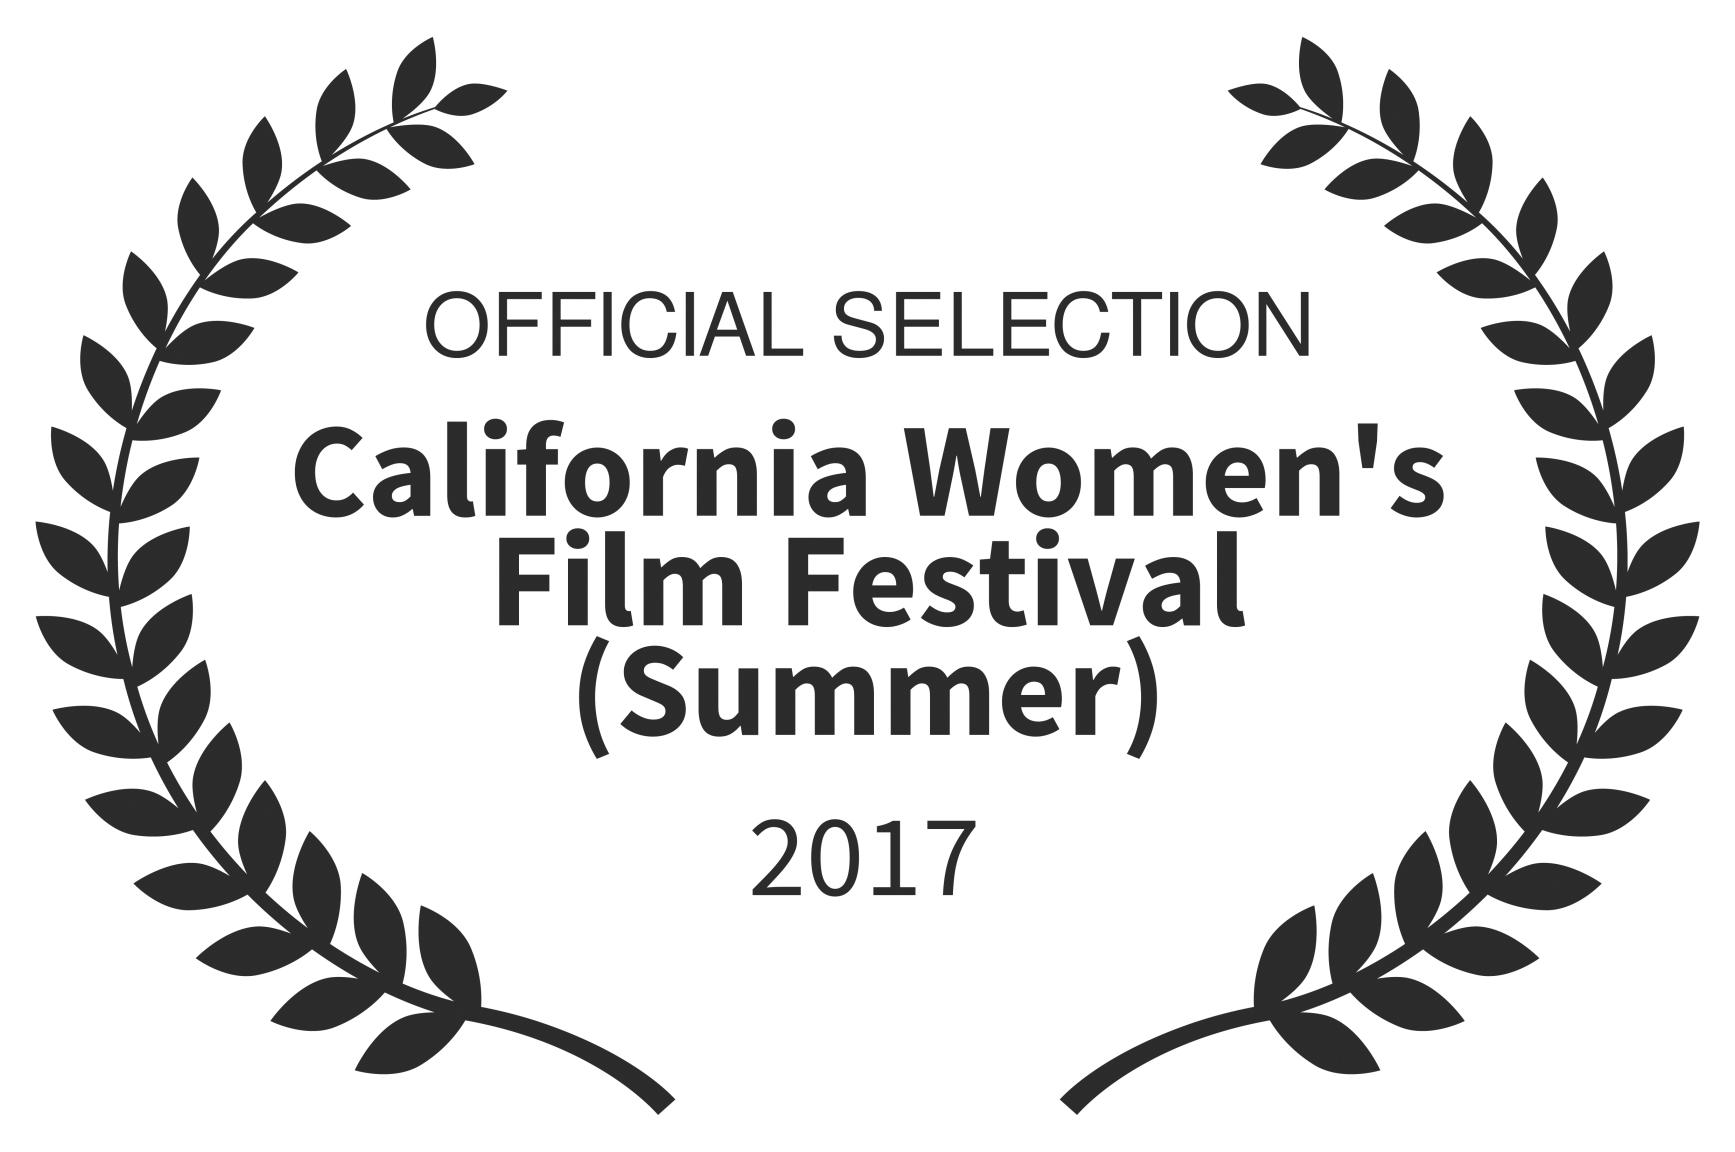 OFFICIAL SELECTION - California Womens Film Festival Summer - 2017 (1) (0-00-00-00).jpg